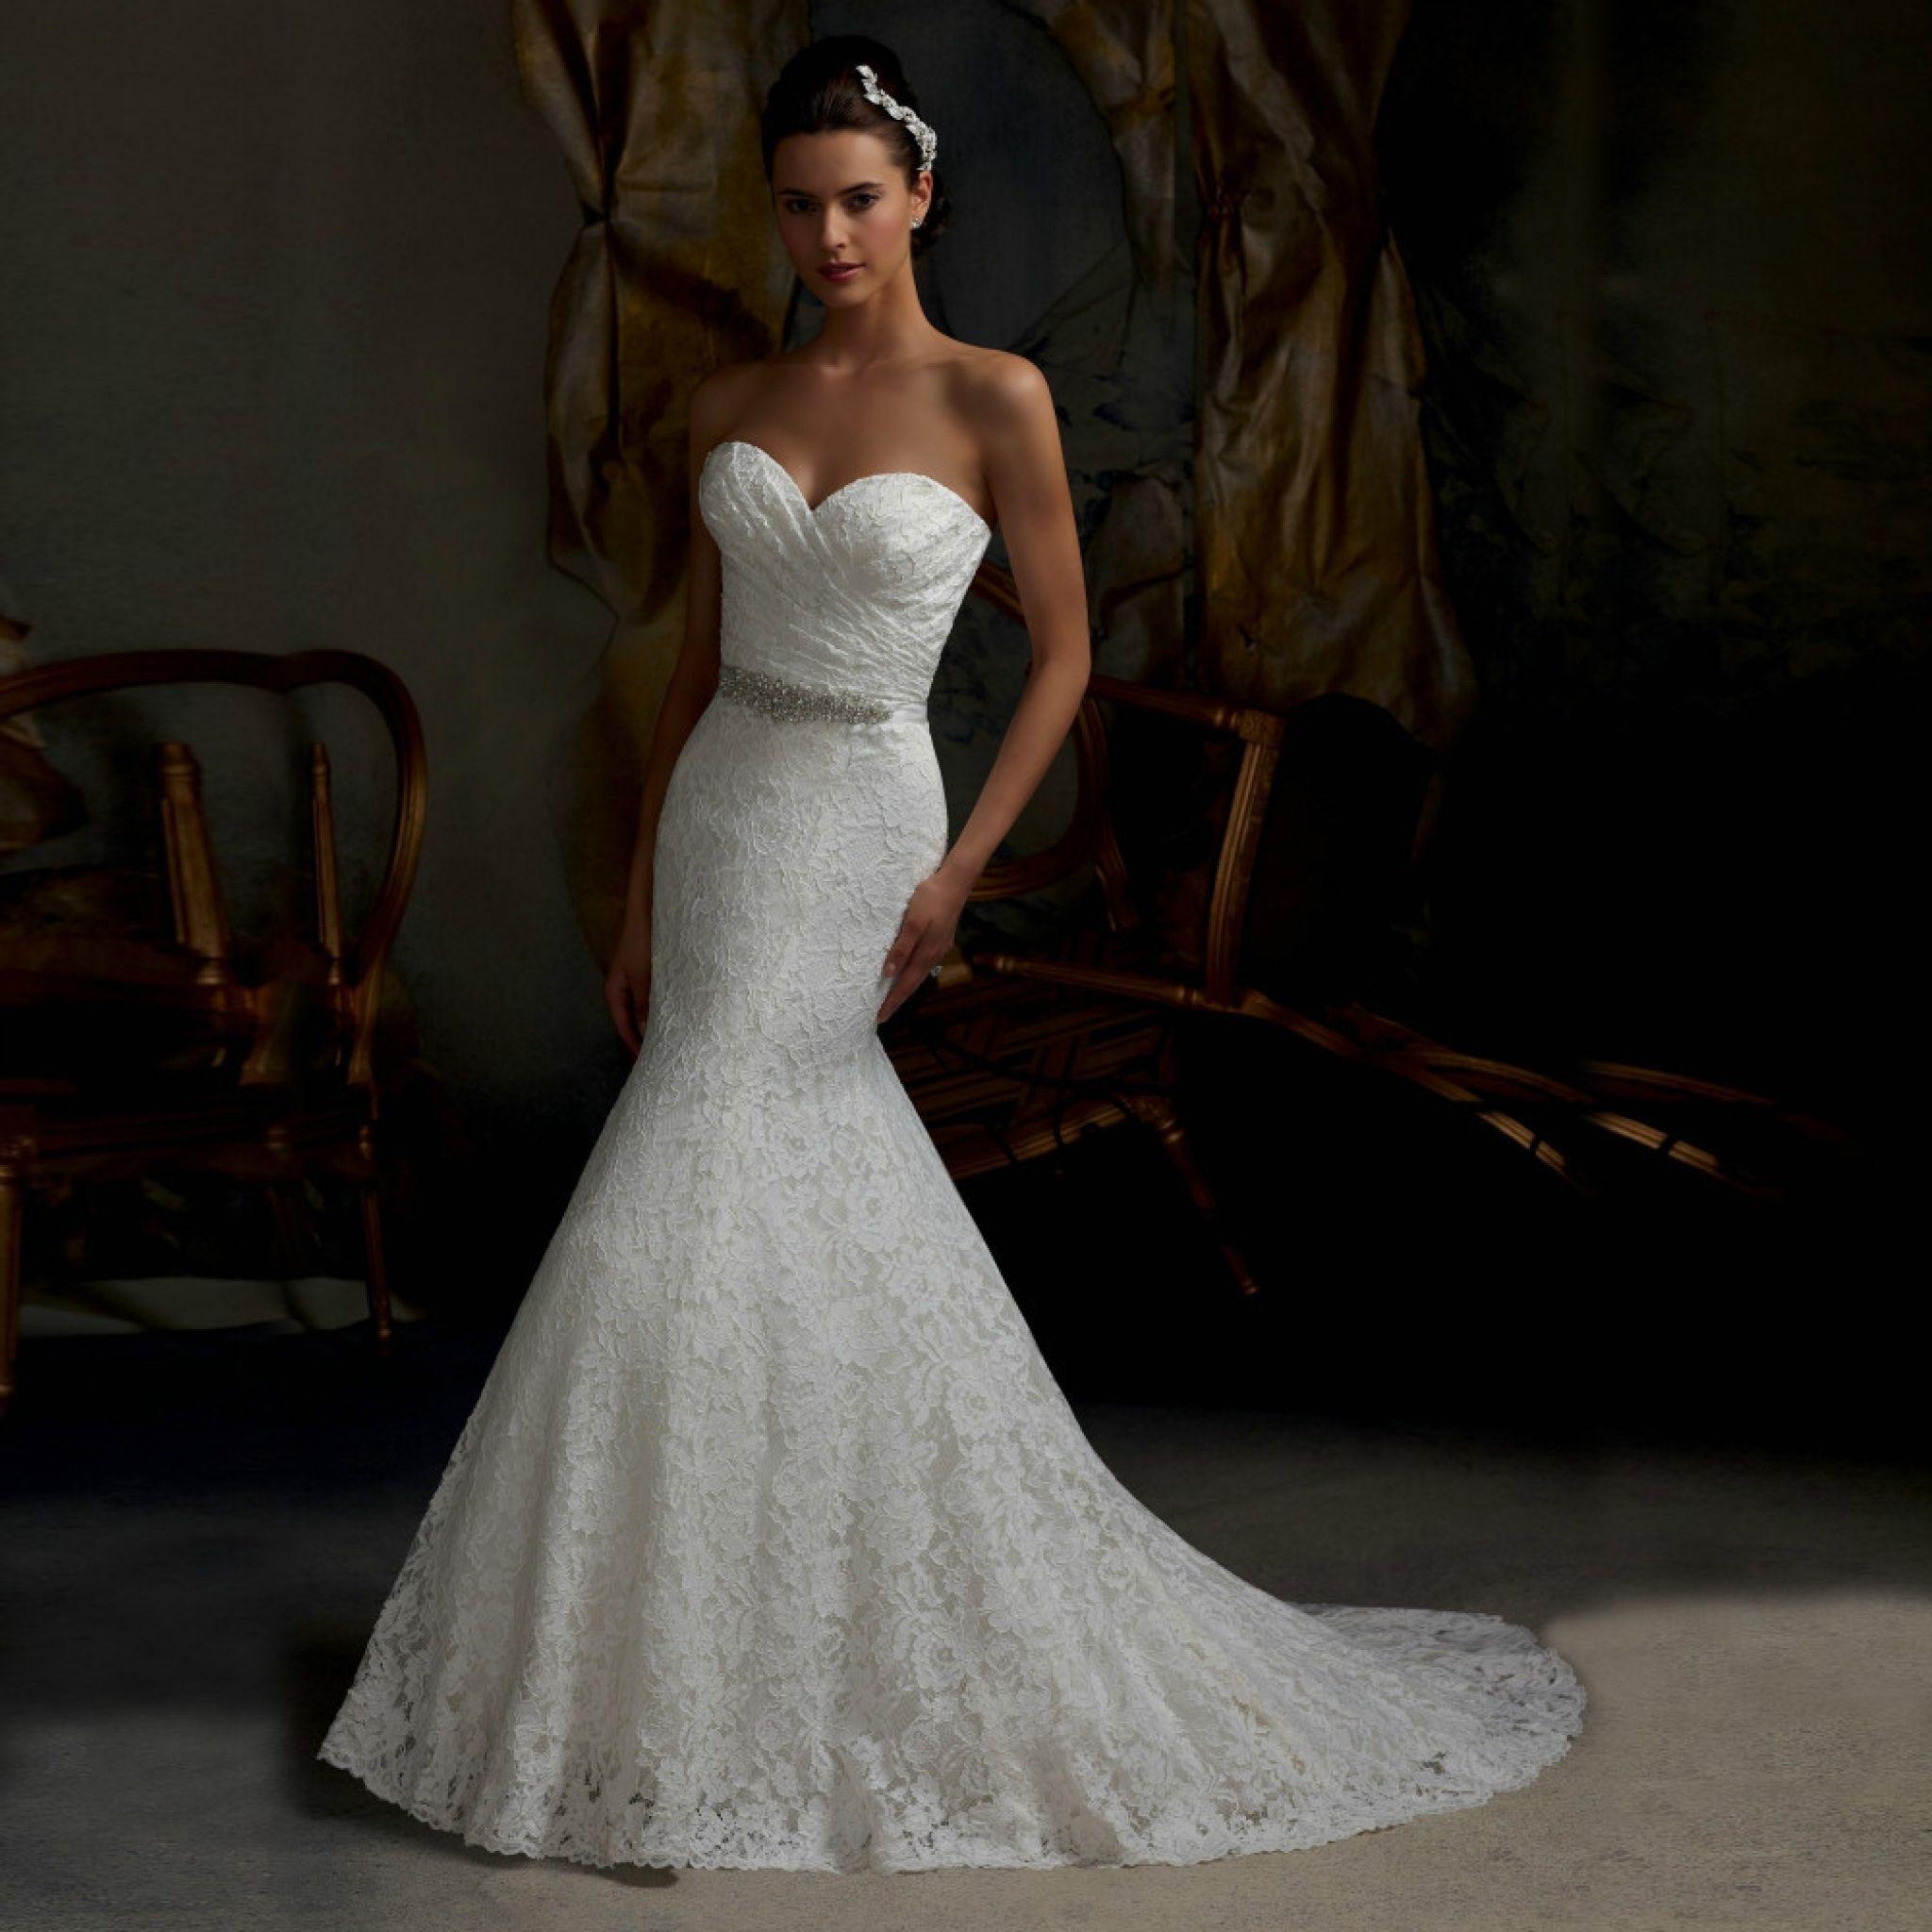 simple western wedding dresses - best dresses for wedding Check ...